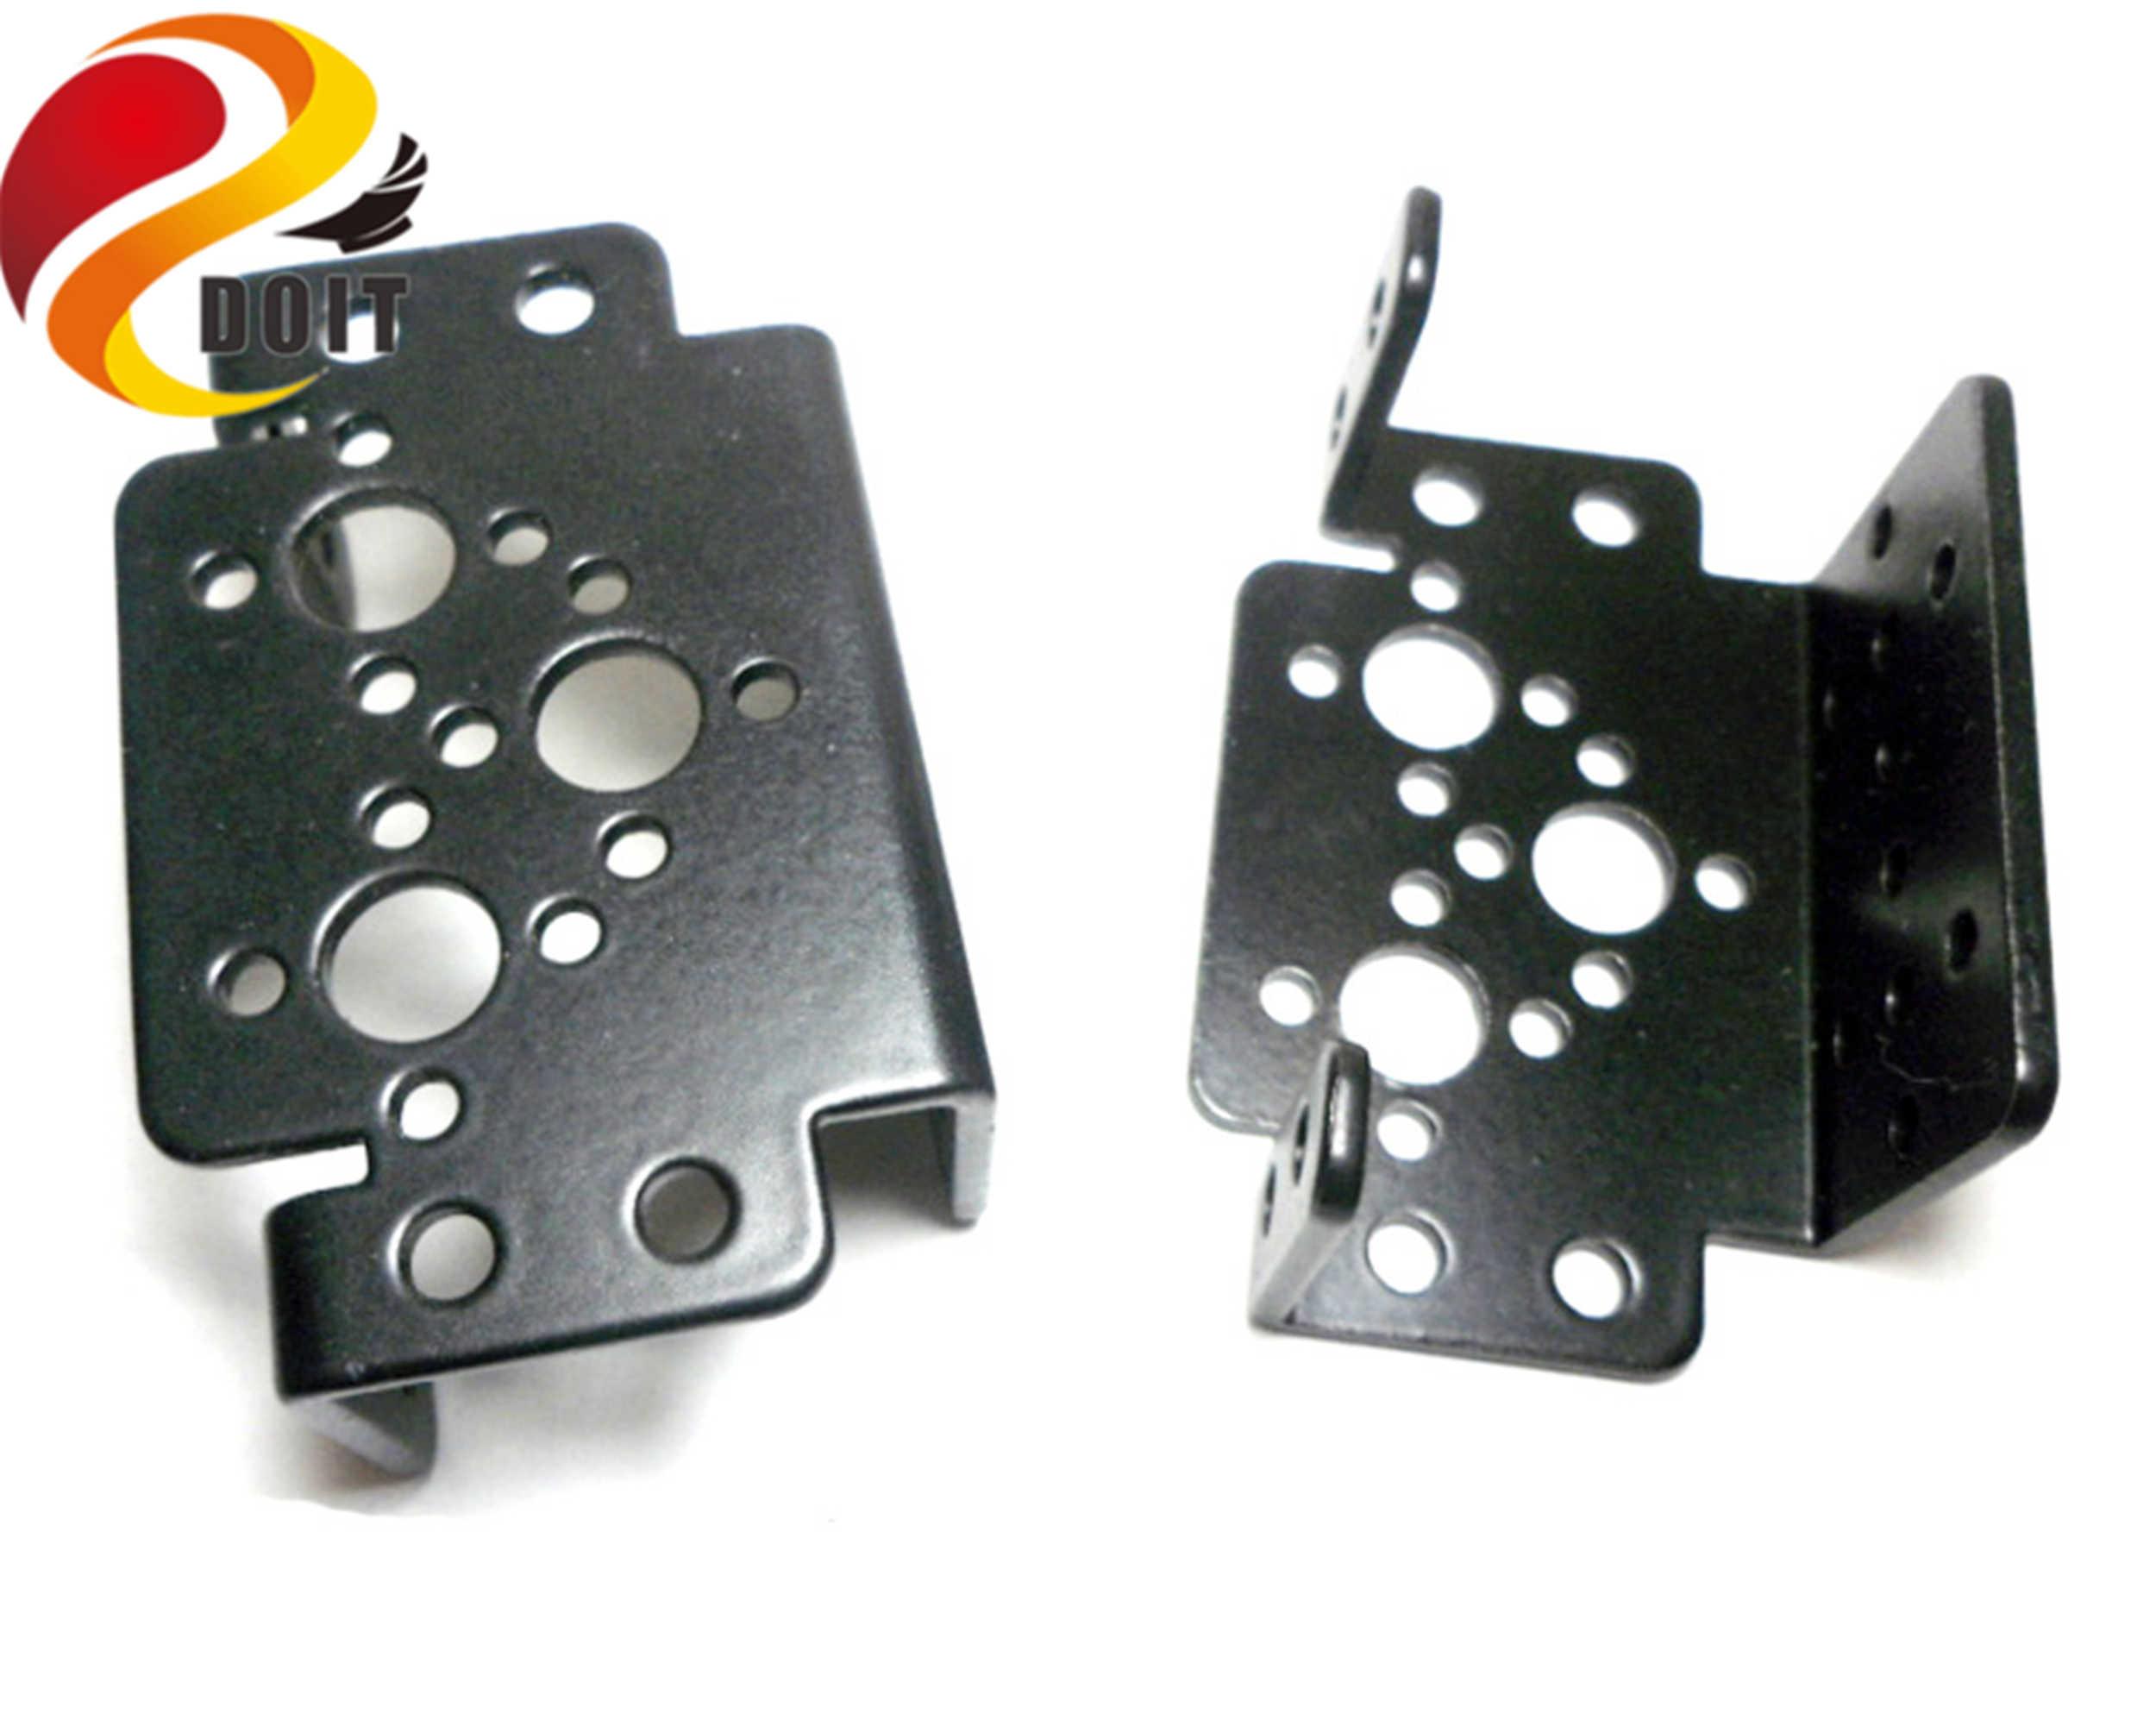 SZDOIT Metal çok fonksiyonlu standart Servo braketi 2mm Pan & Tilt braketi RC robotik kol parçası